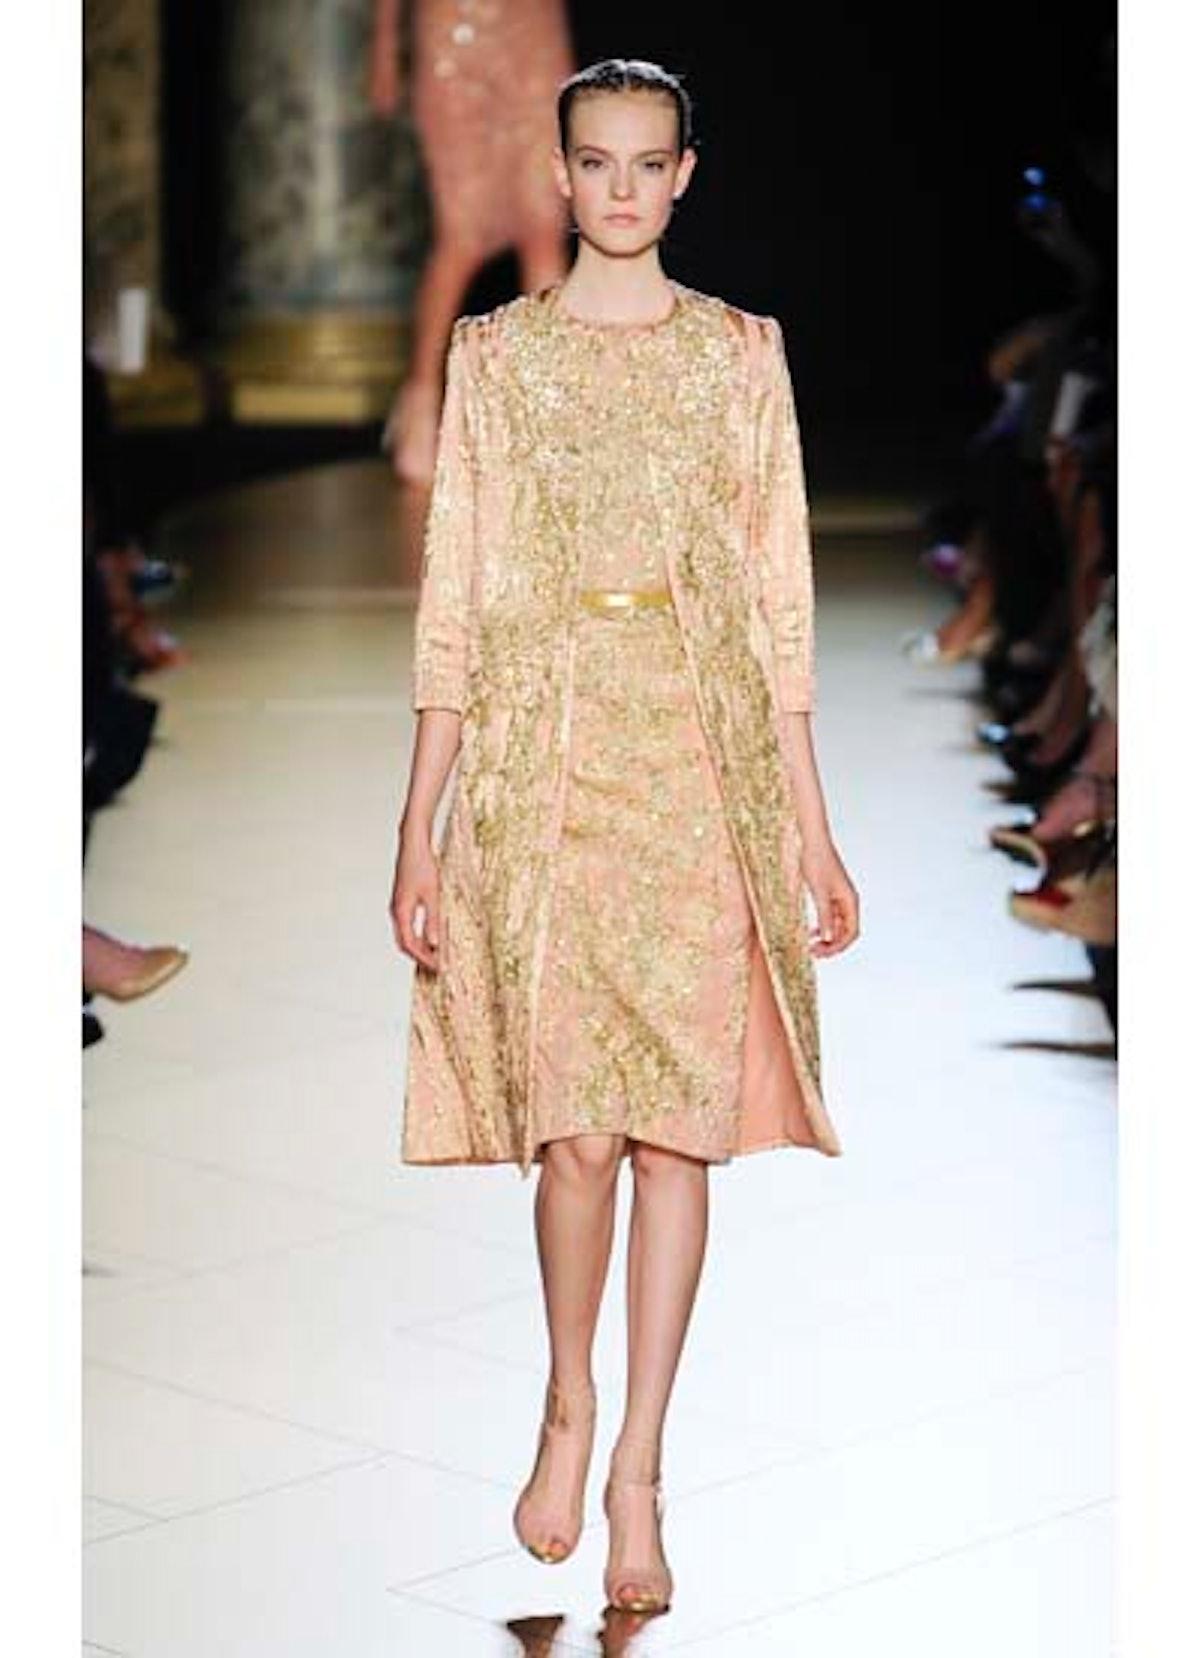 fass-elie-saab-couture-2012-runway-15-v.jpg